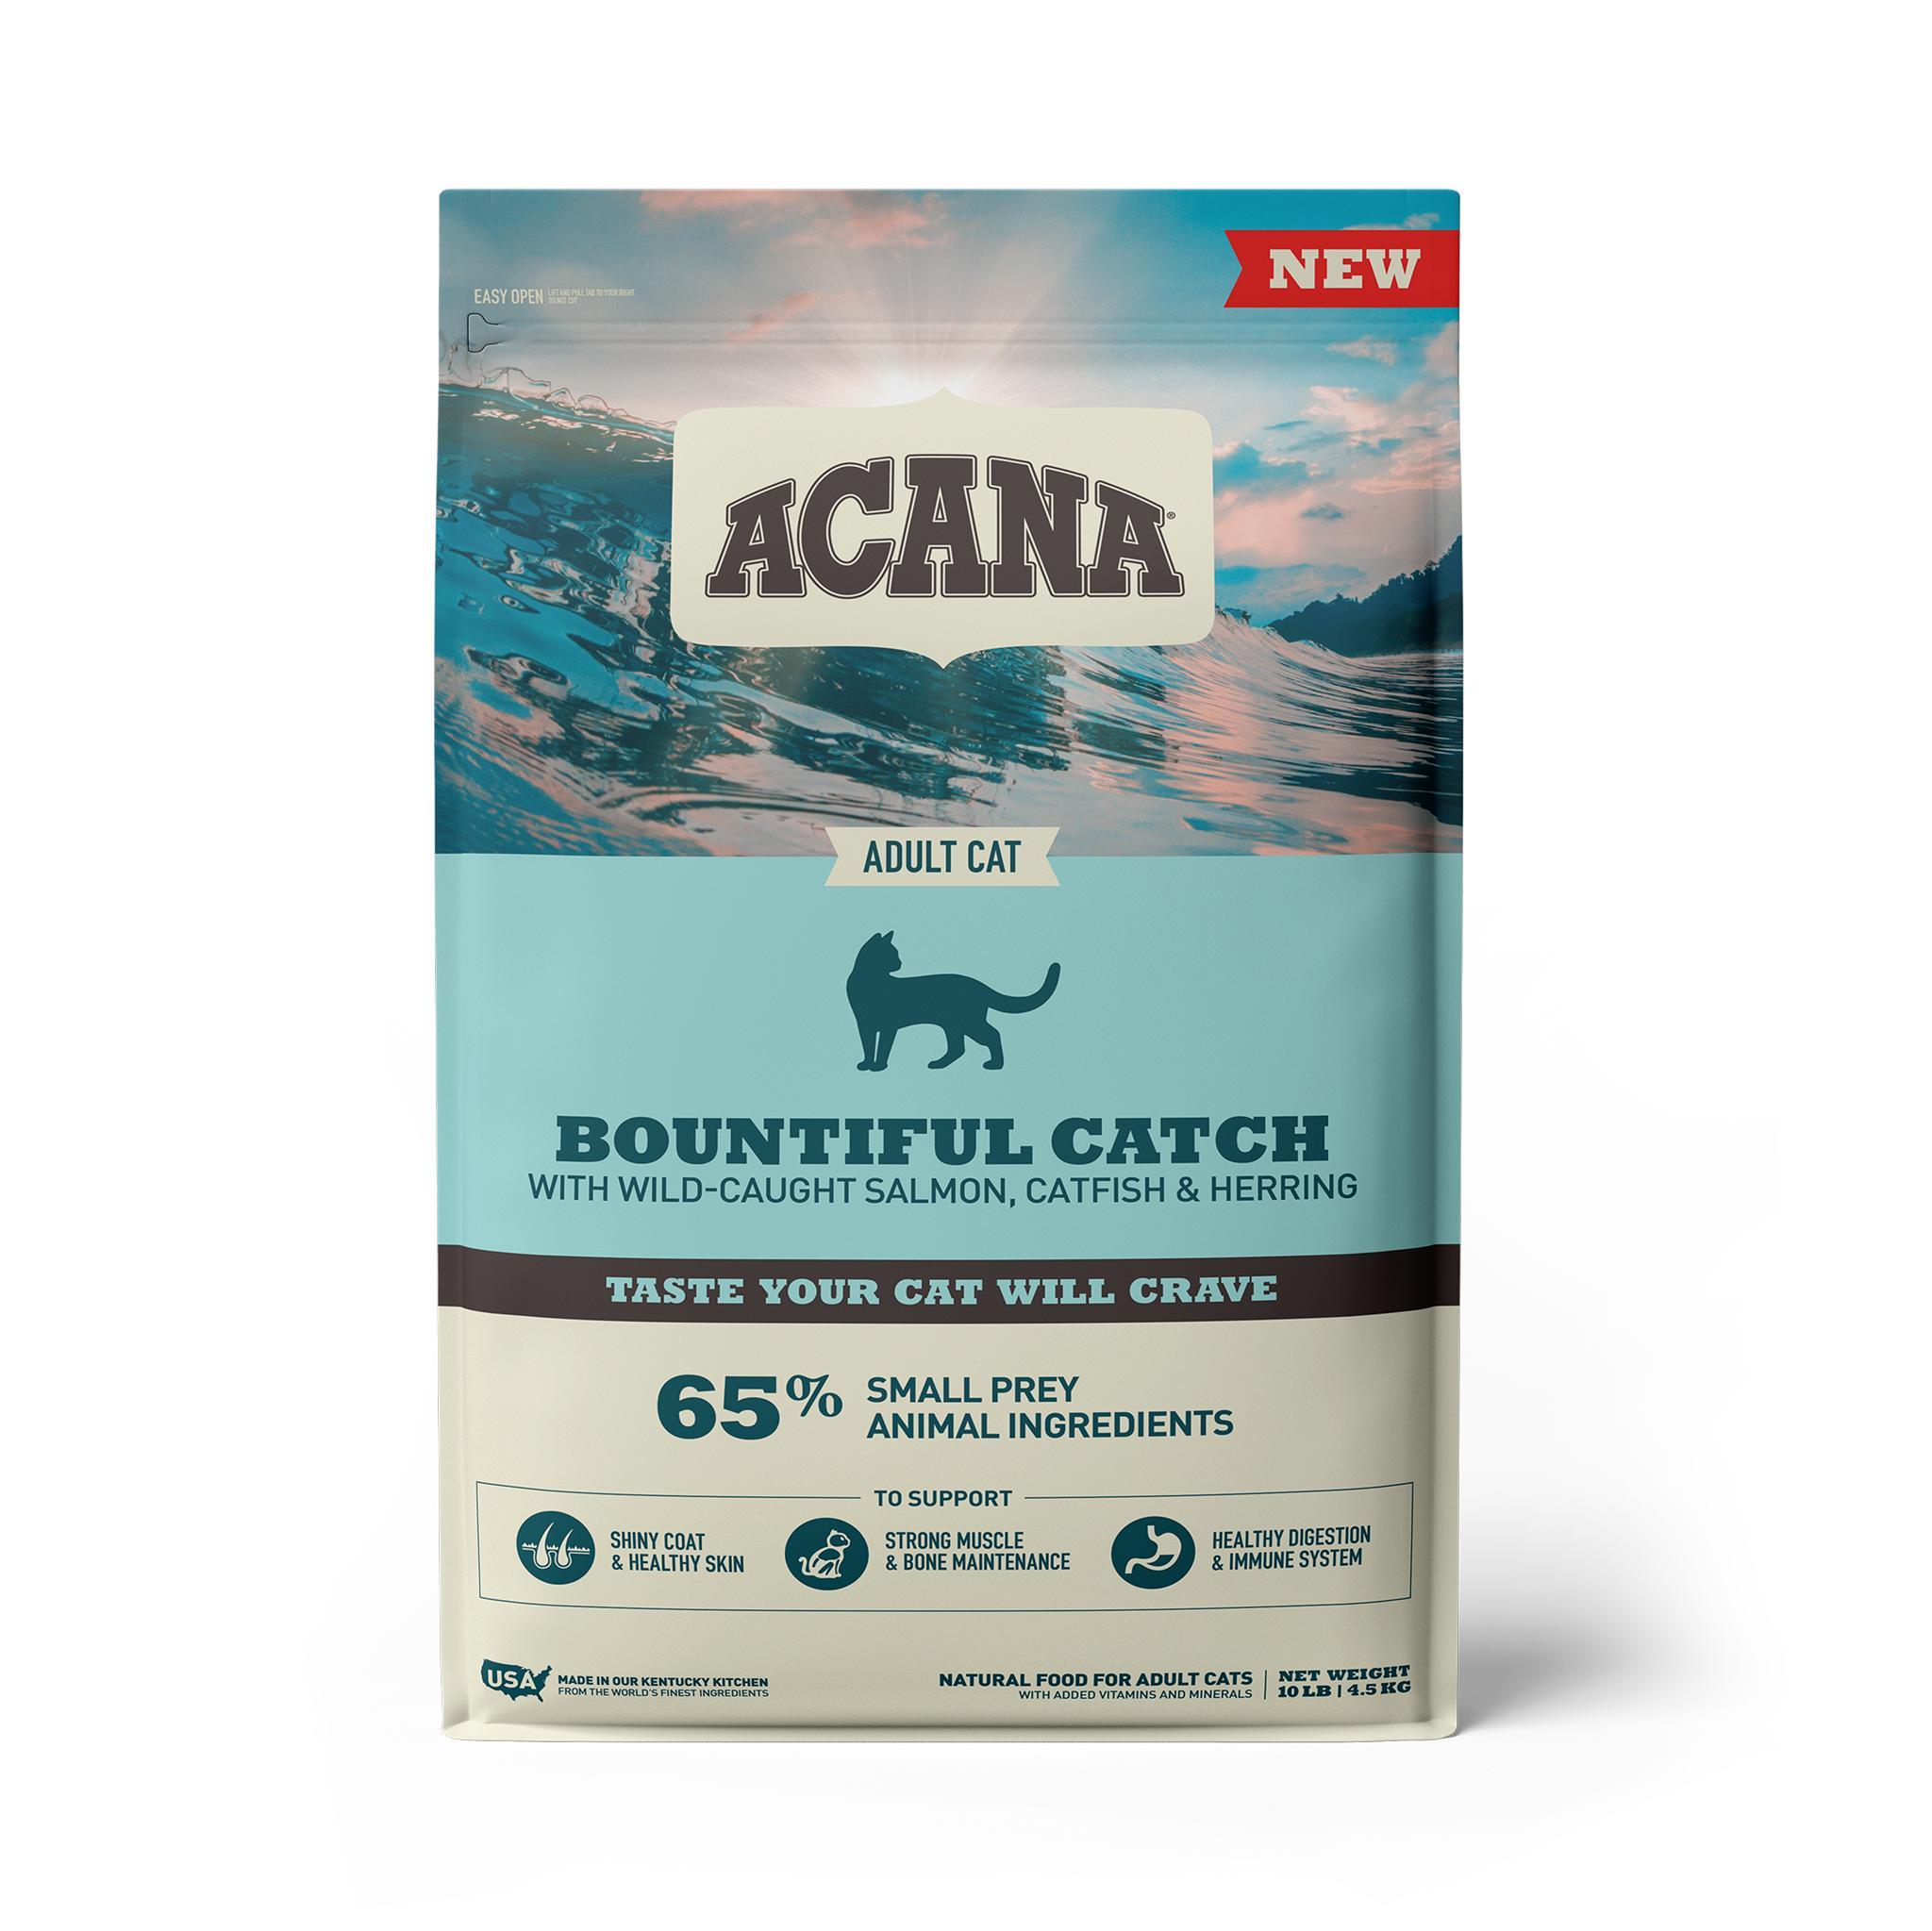 ACANA Bountiful Catch Dry Cat Food, 10-lb